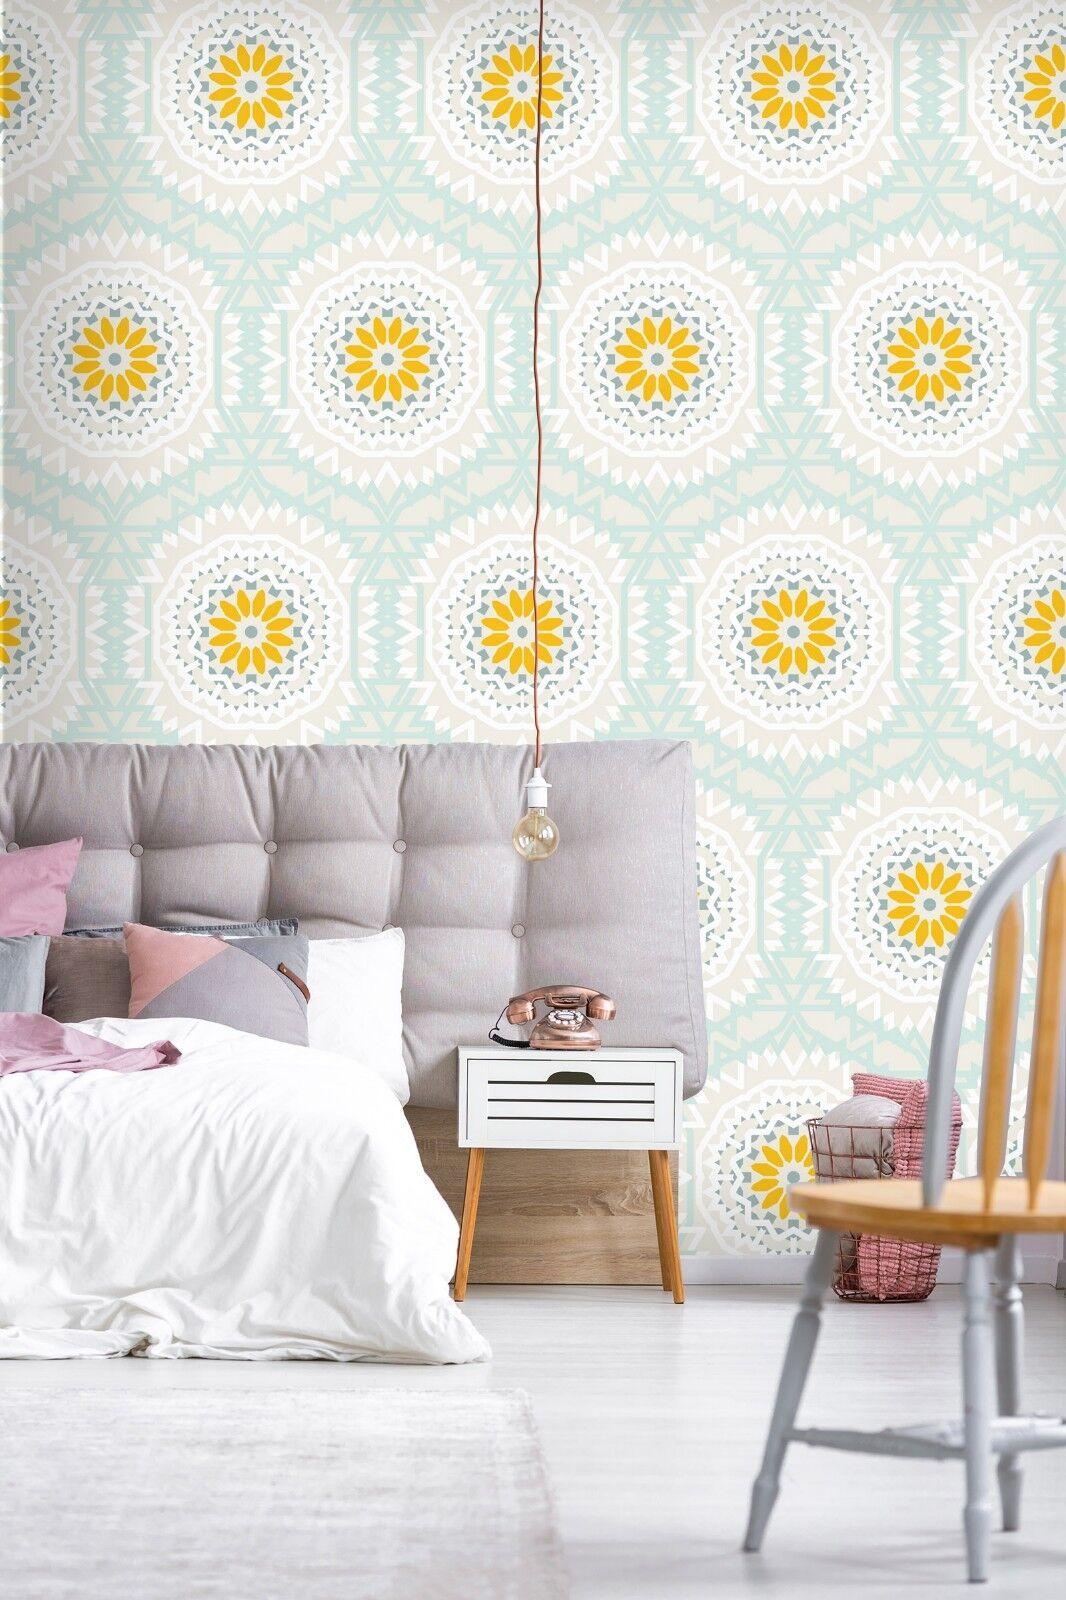 3D Golden Floral 8 Wall Paper Print Wall Decal Deco Indoor Wall Murals US Summer